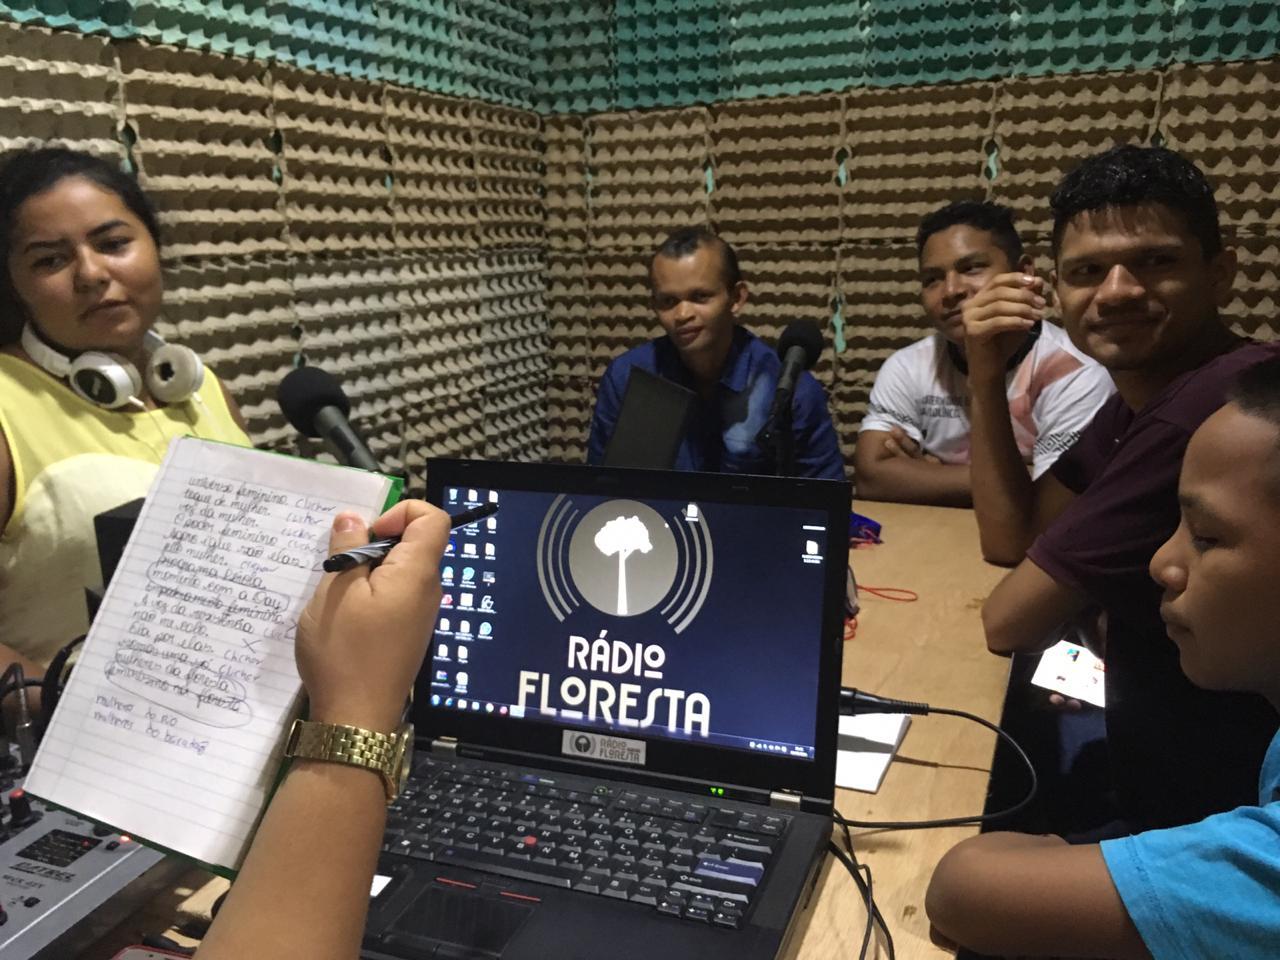 radio floresta 00